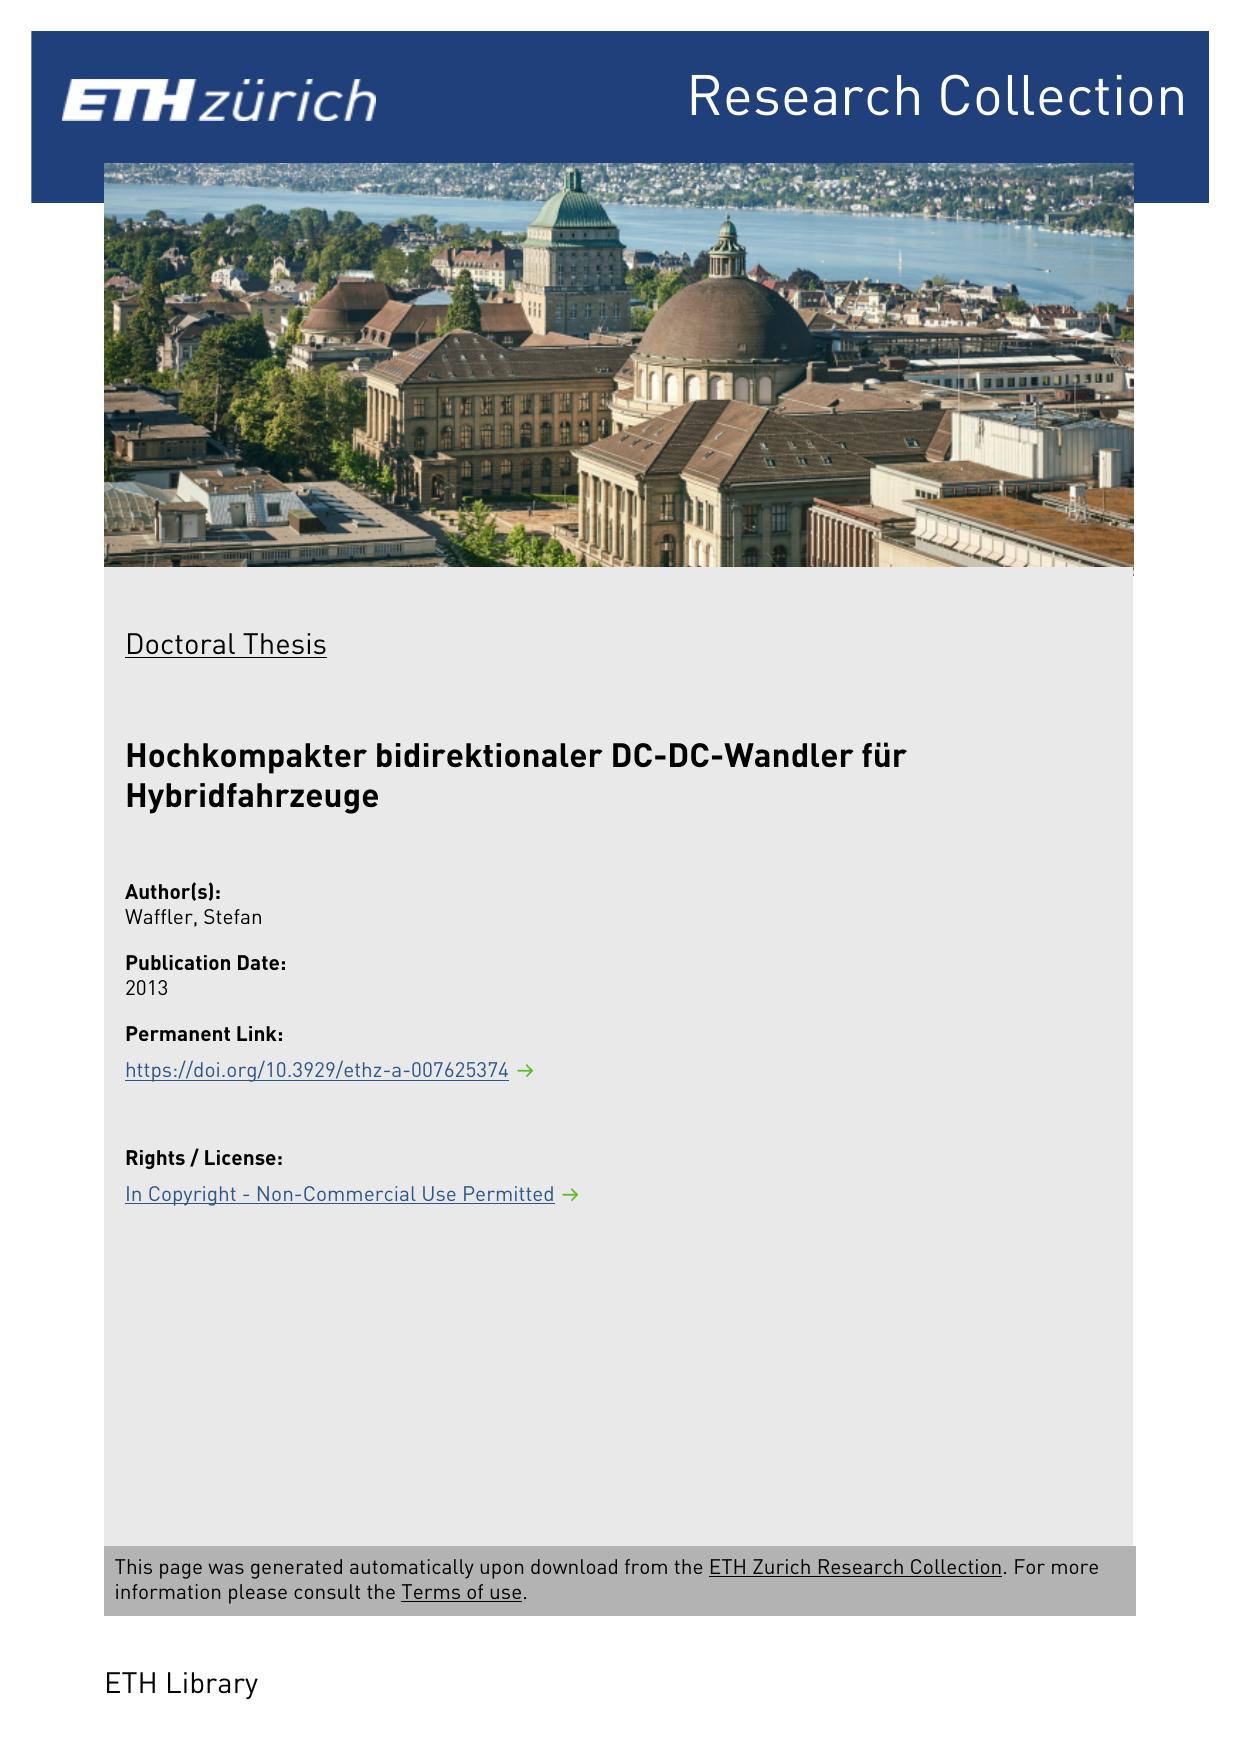 Hochkompakter bidirektionaler DC DC